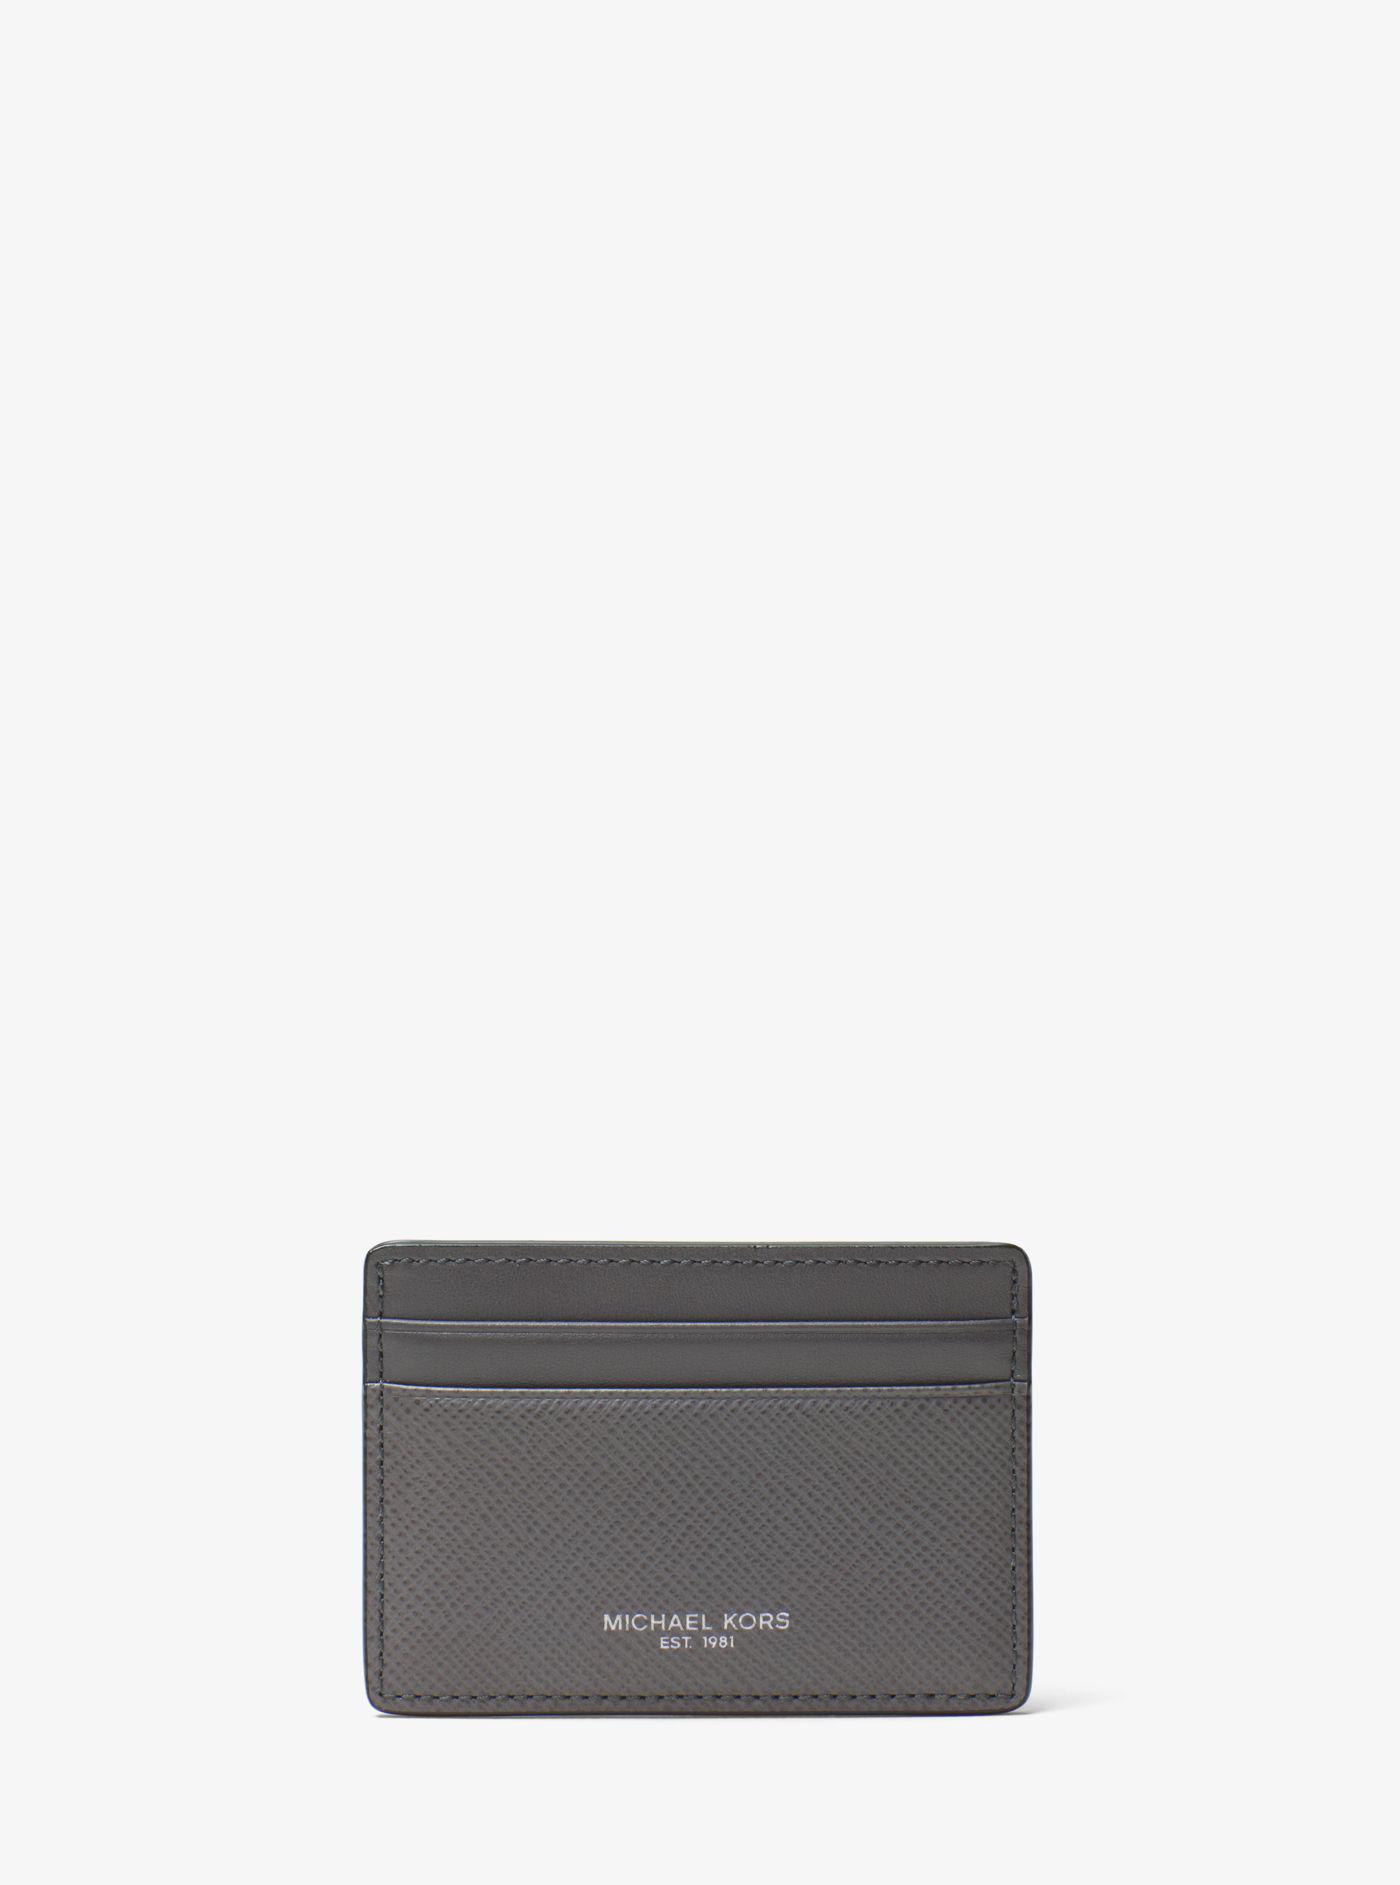 775275c5a862 Lyst - Michael Kors Harrison Leather Card Case in Black for Men ...